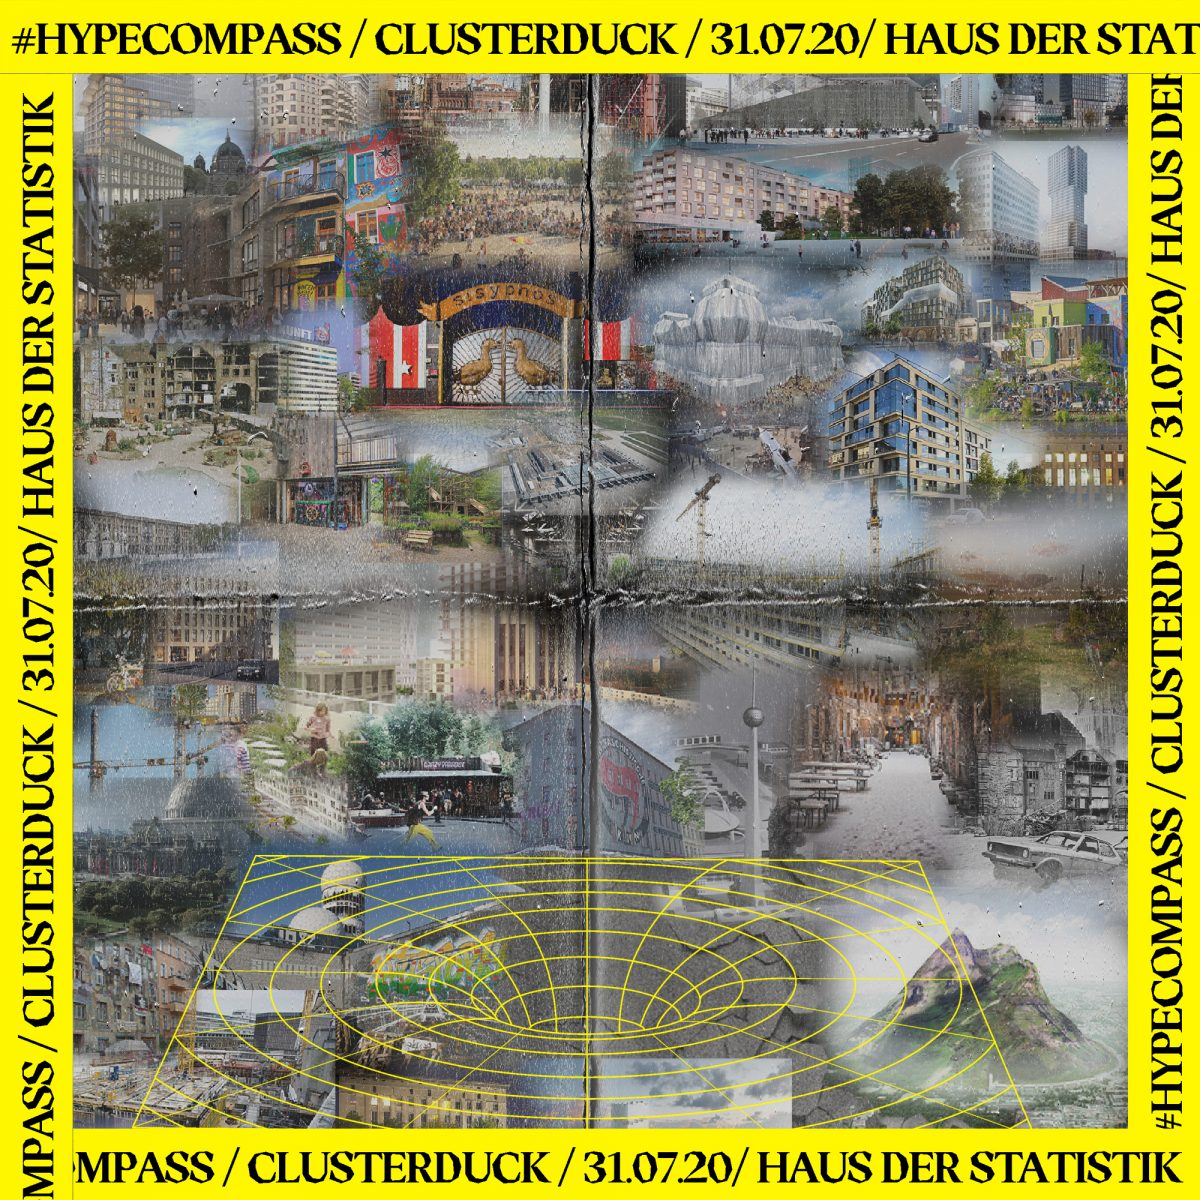 Hypecompass – Berlin Edition